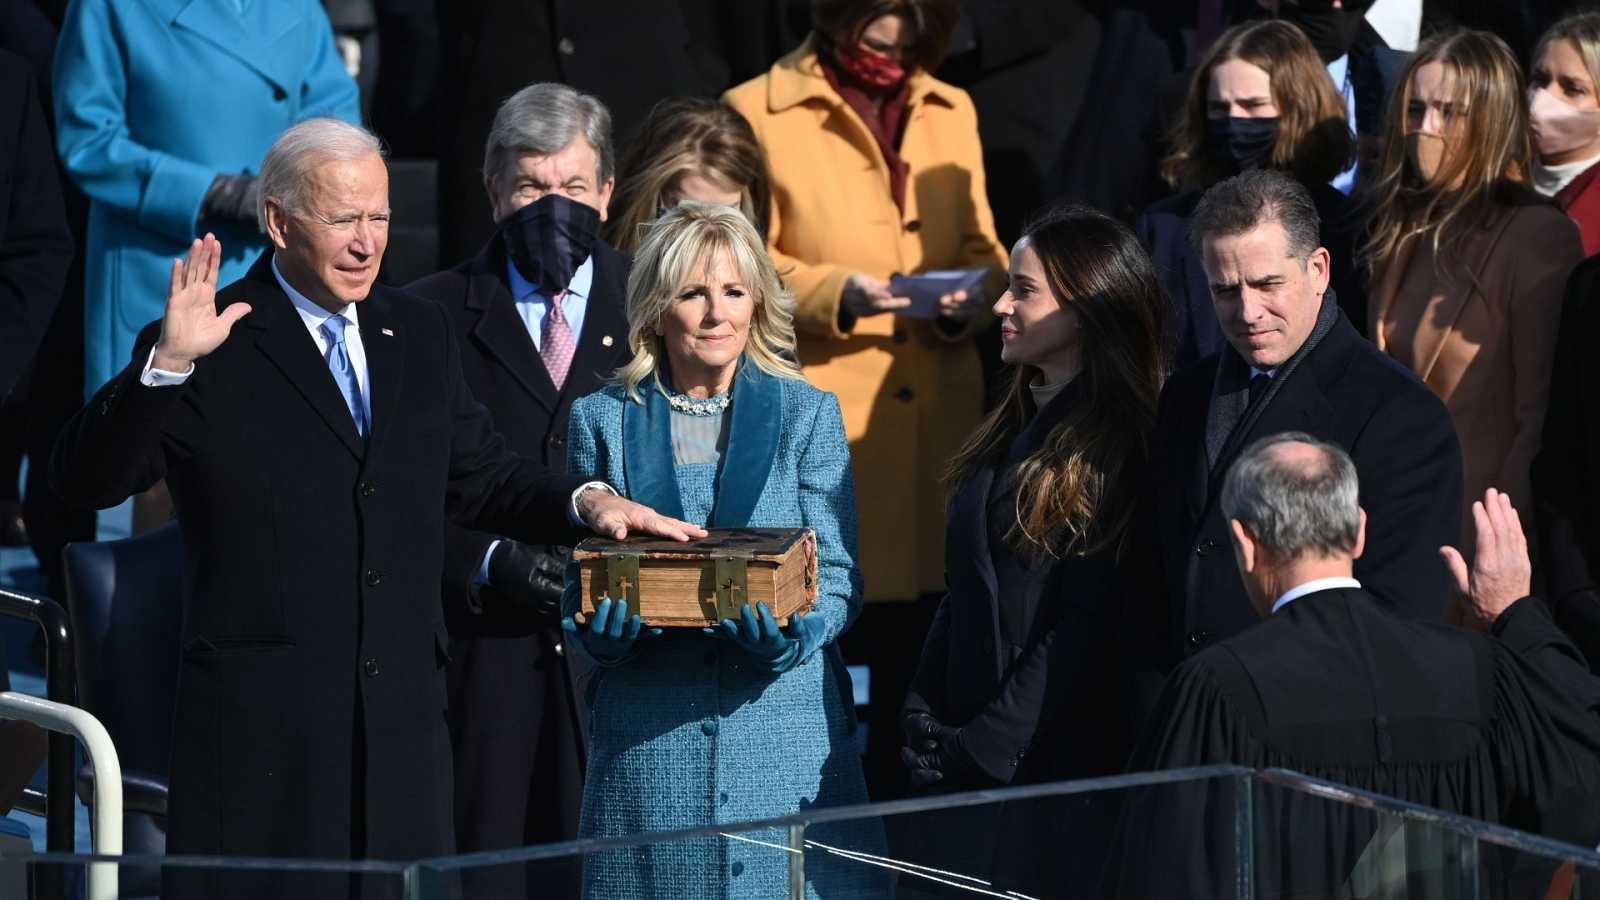 Especial informativo - Toma de posesión de Biden como presidente de EEUU - ver ahora